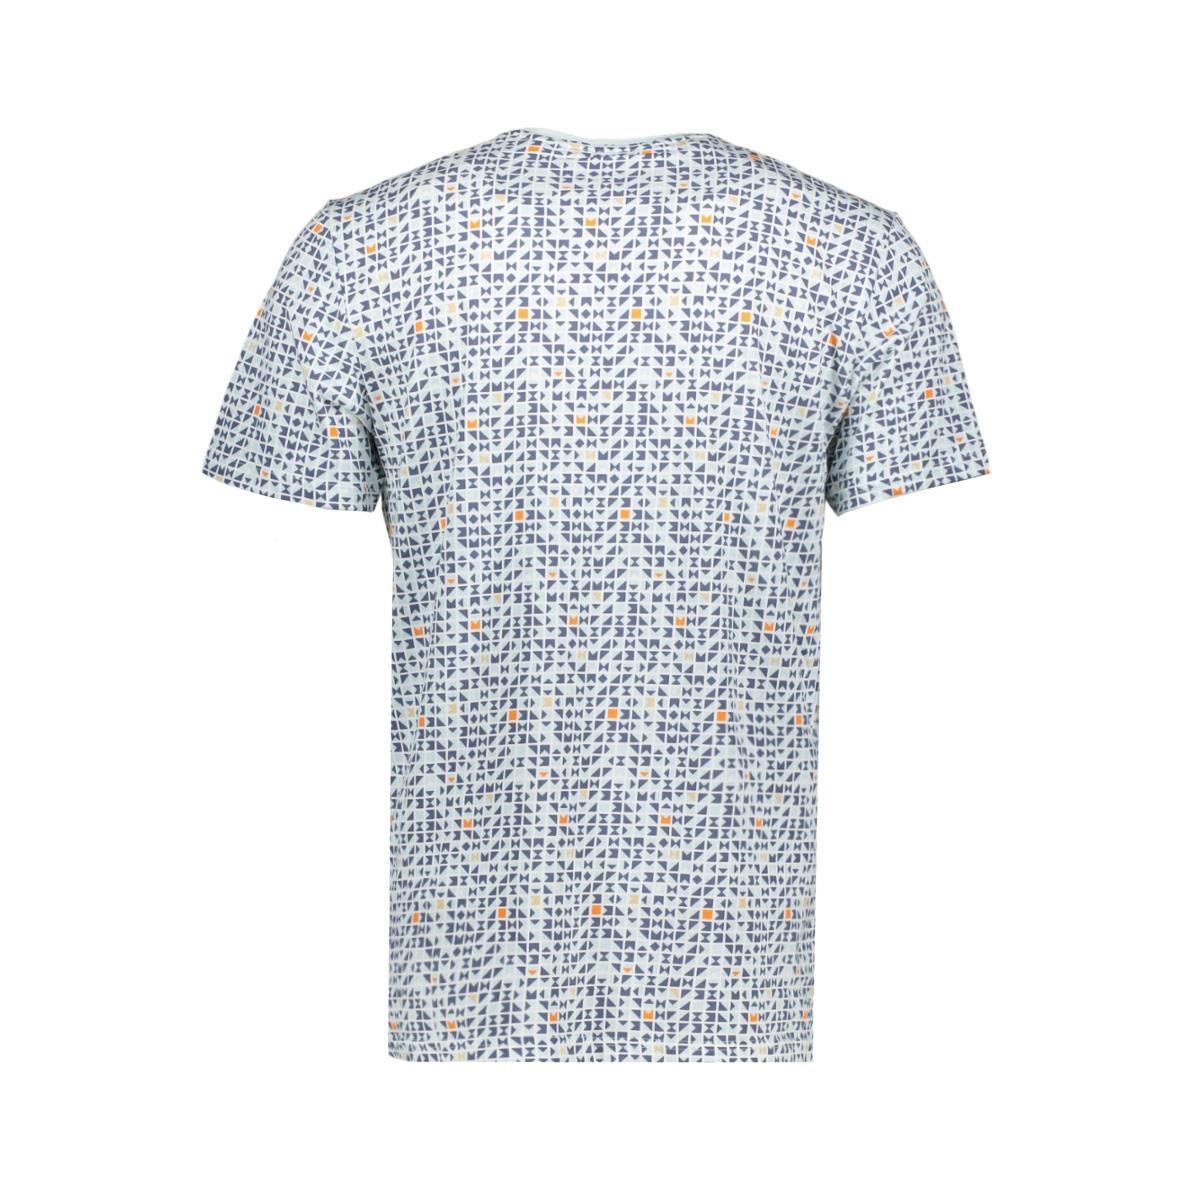 onstrey reg ss aop tee 22015169 only & sons t-shirt blue ice